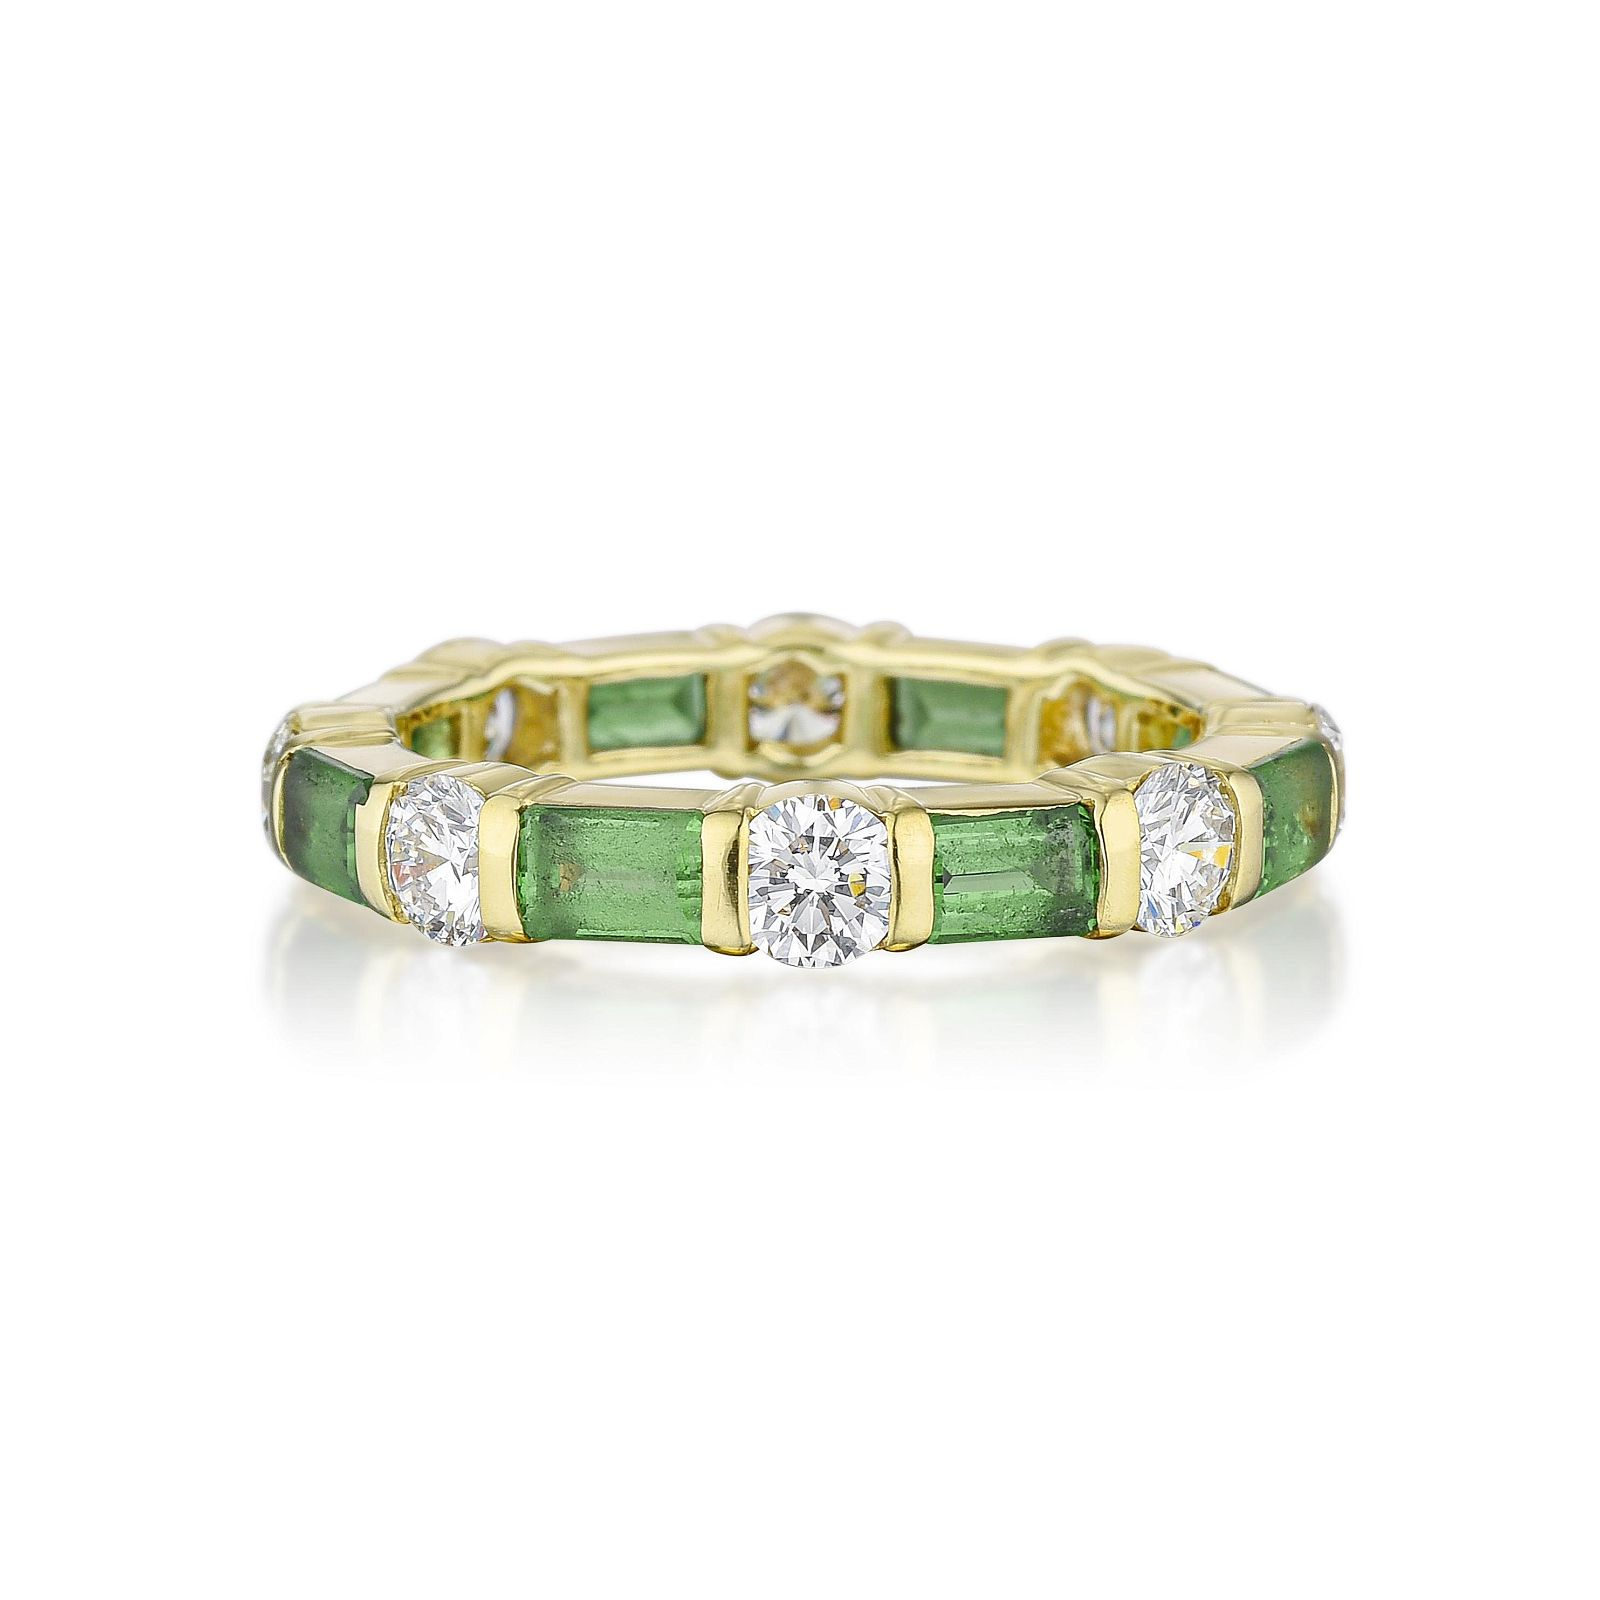 Tiffany & Co. Peridot and Diamond Eternity Band